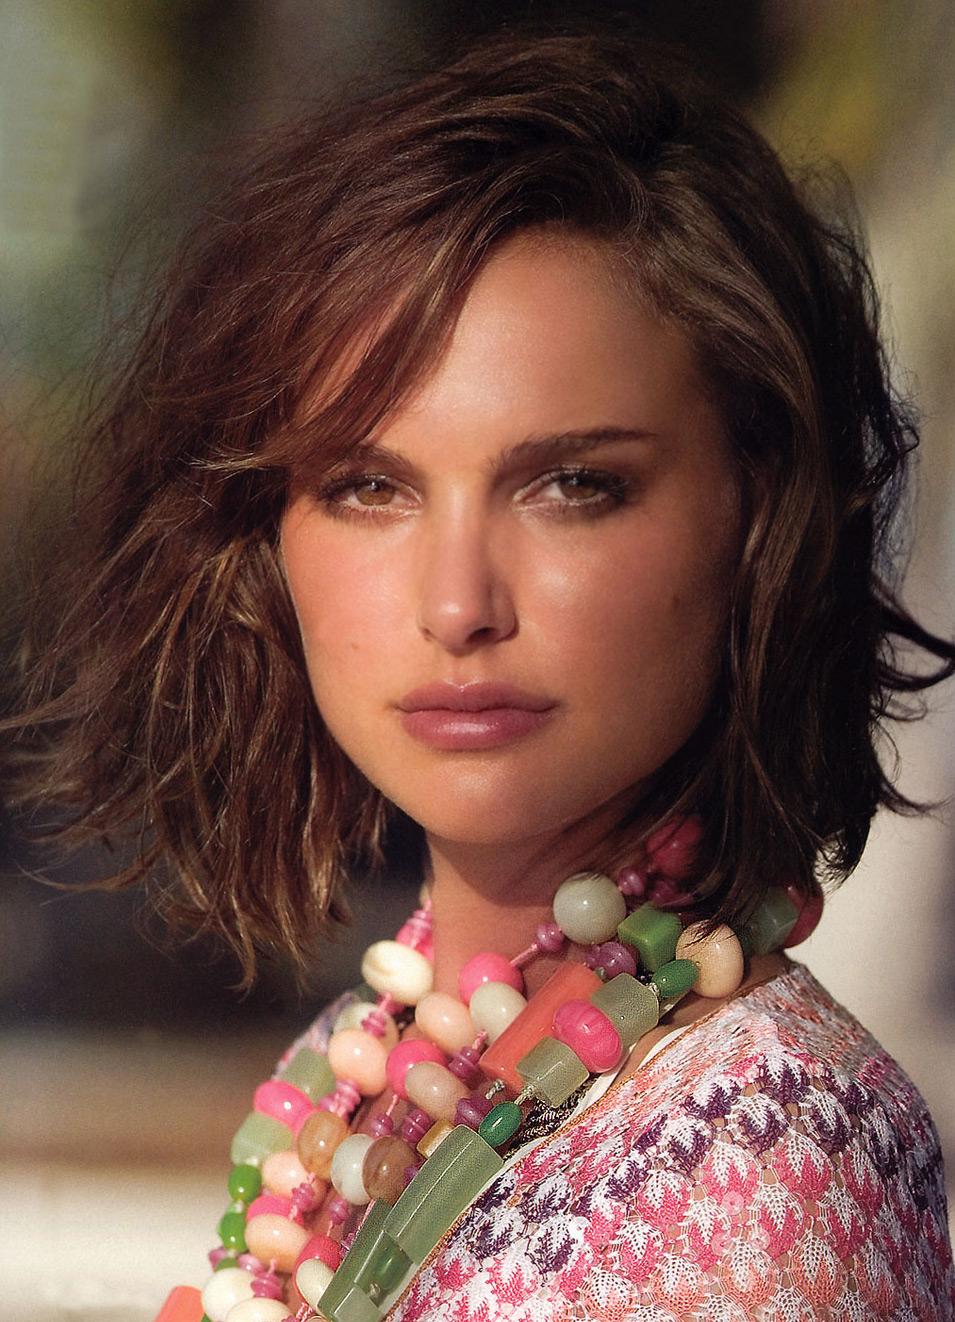 Natalie-Portman-hairstyle.jpg